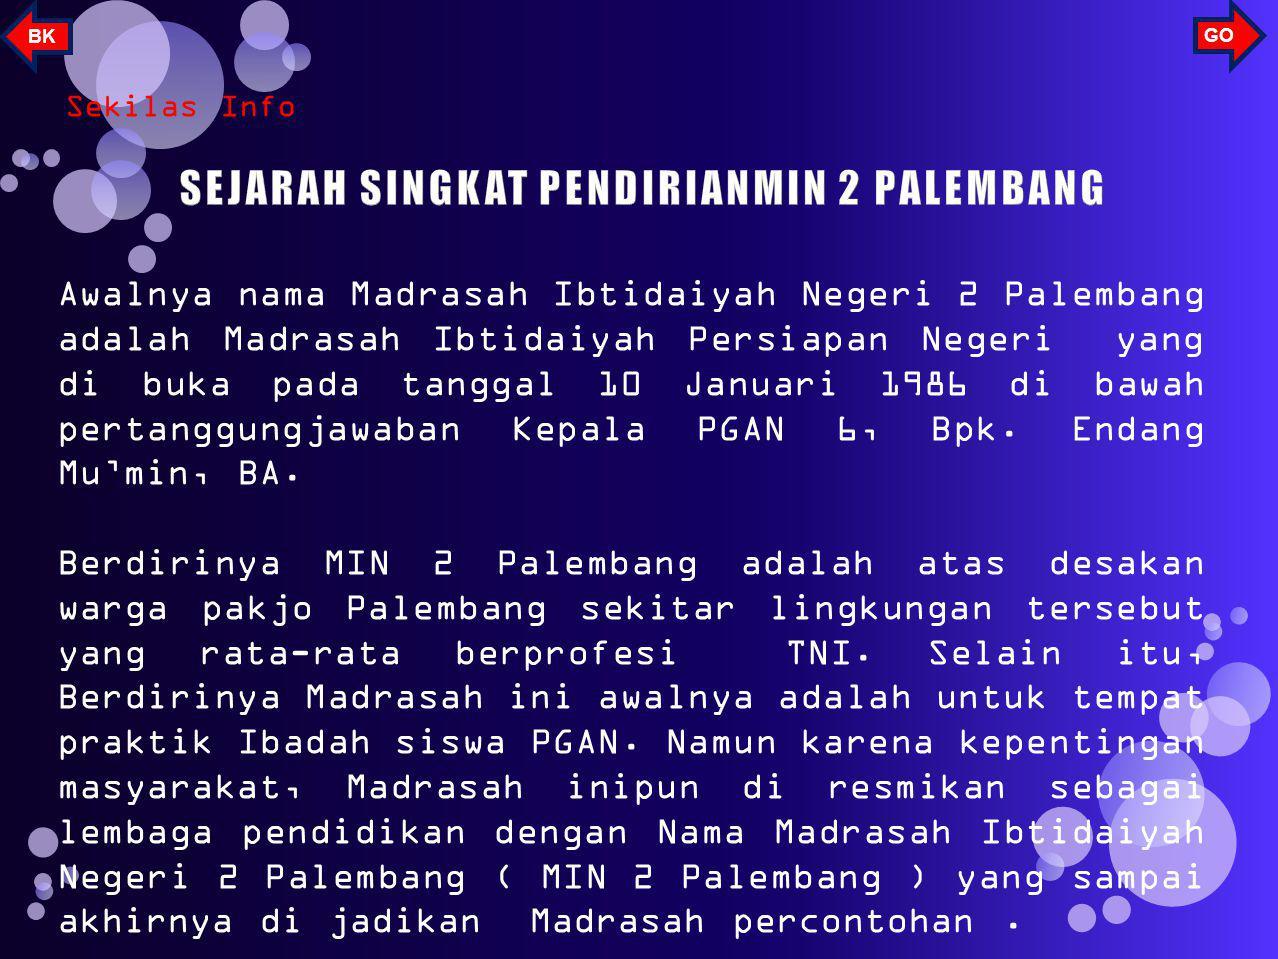 SEJARAH SINGKAT PENDIRIANMIN 2 PALEMBANG